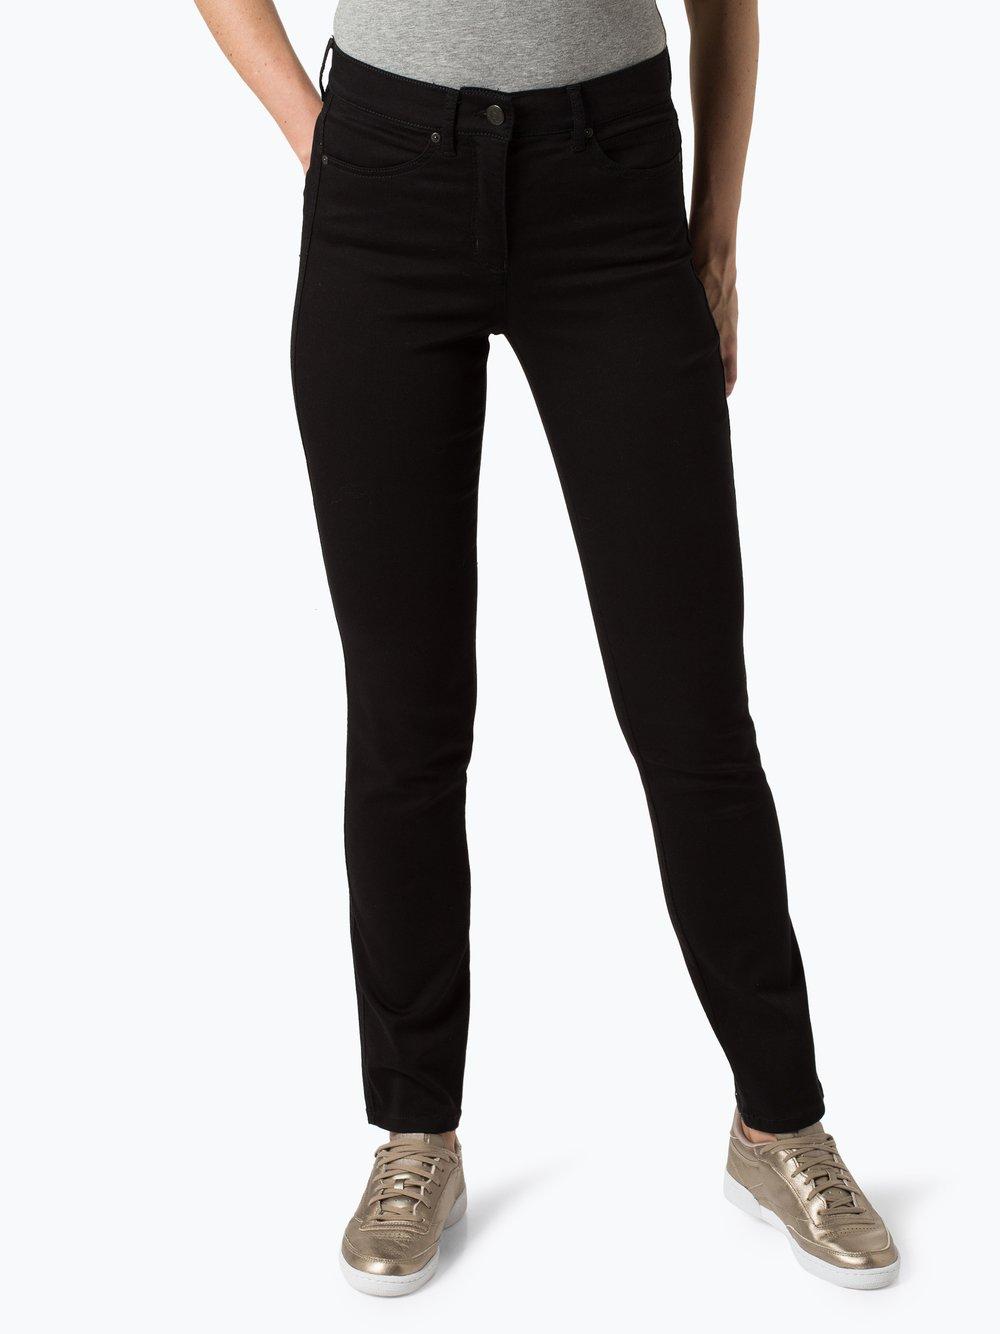 TONI – Spodnie damskie, czarny Van Graaf 352674-0002-00210